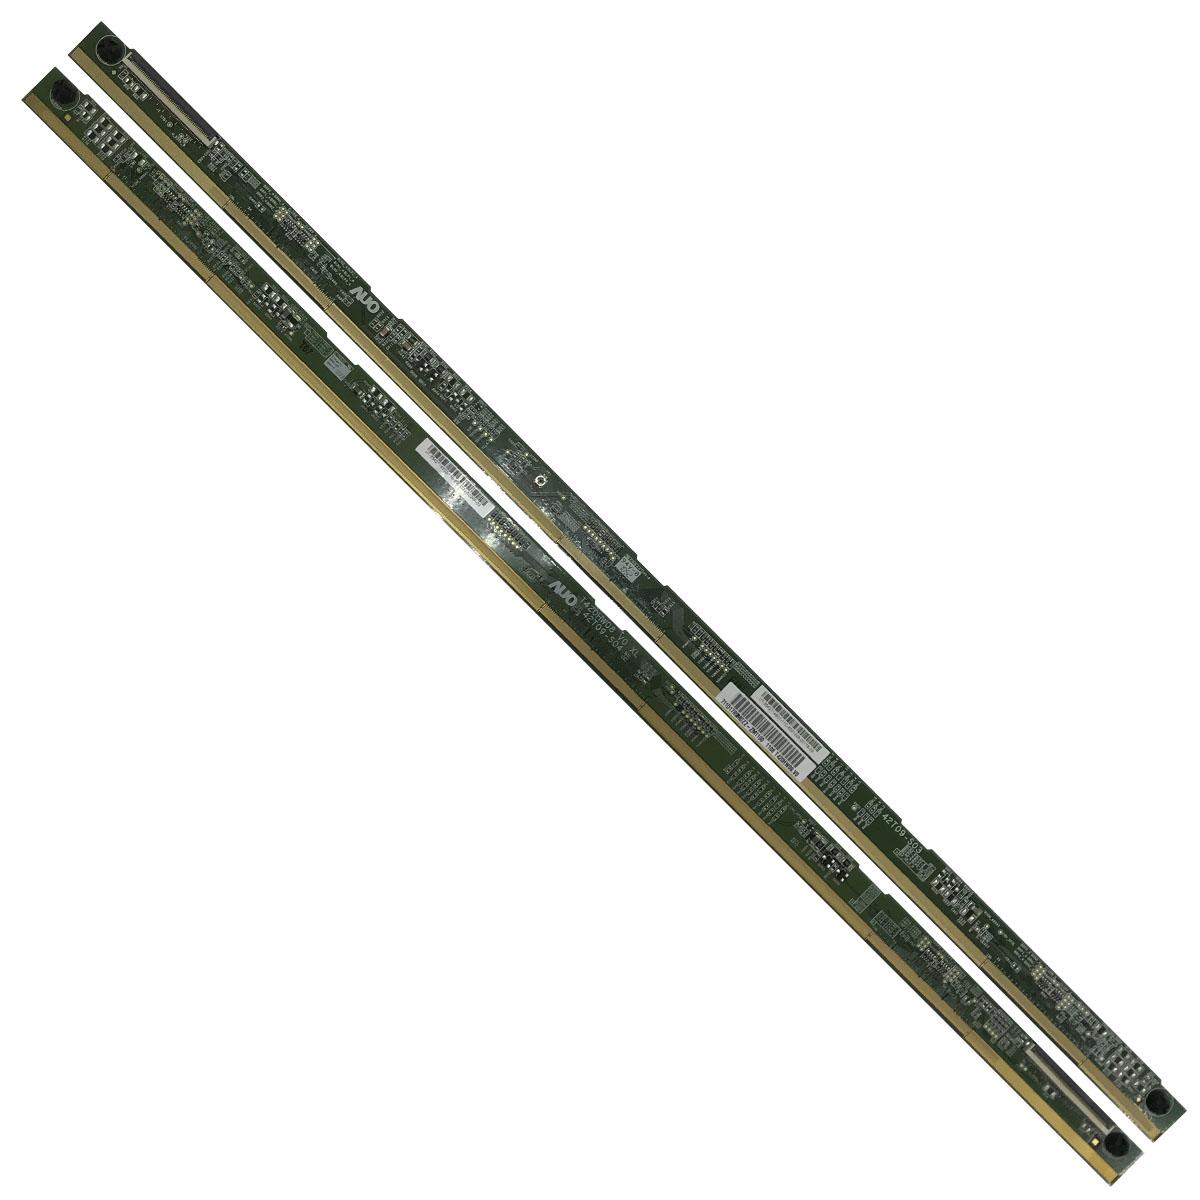 Планки матрицы T420HW08 V0 XL (42T09-S03/42T09-S04) для LG 42LK451